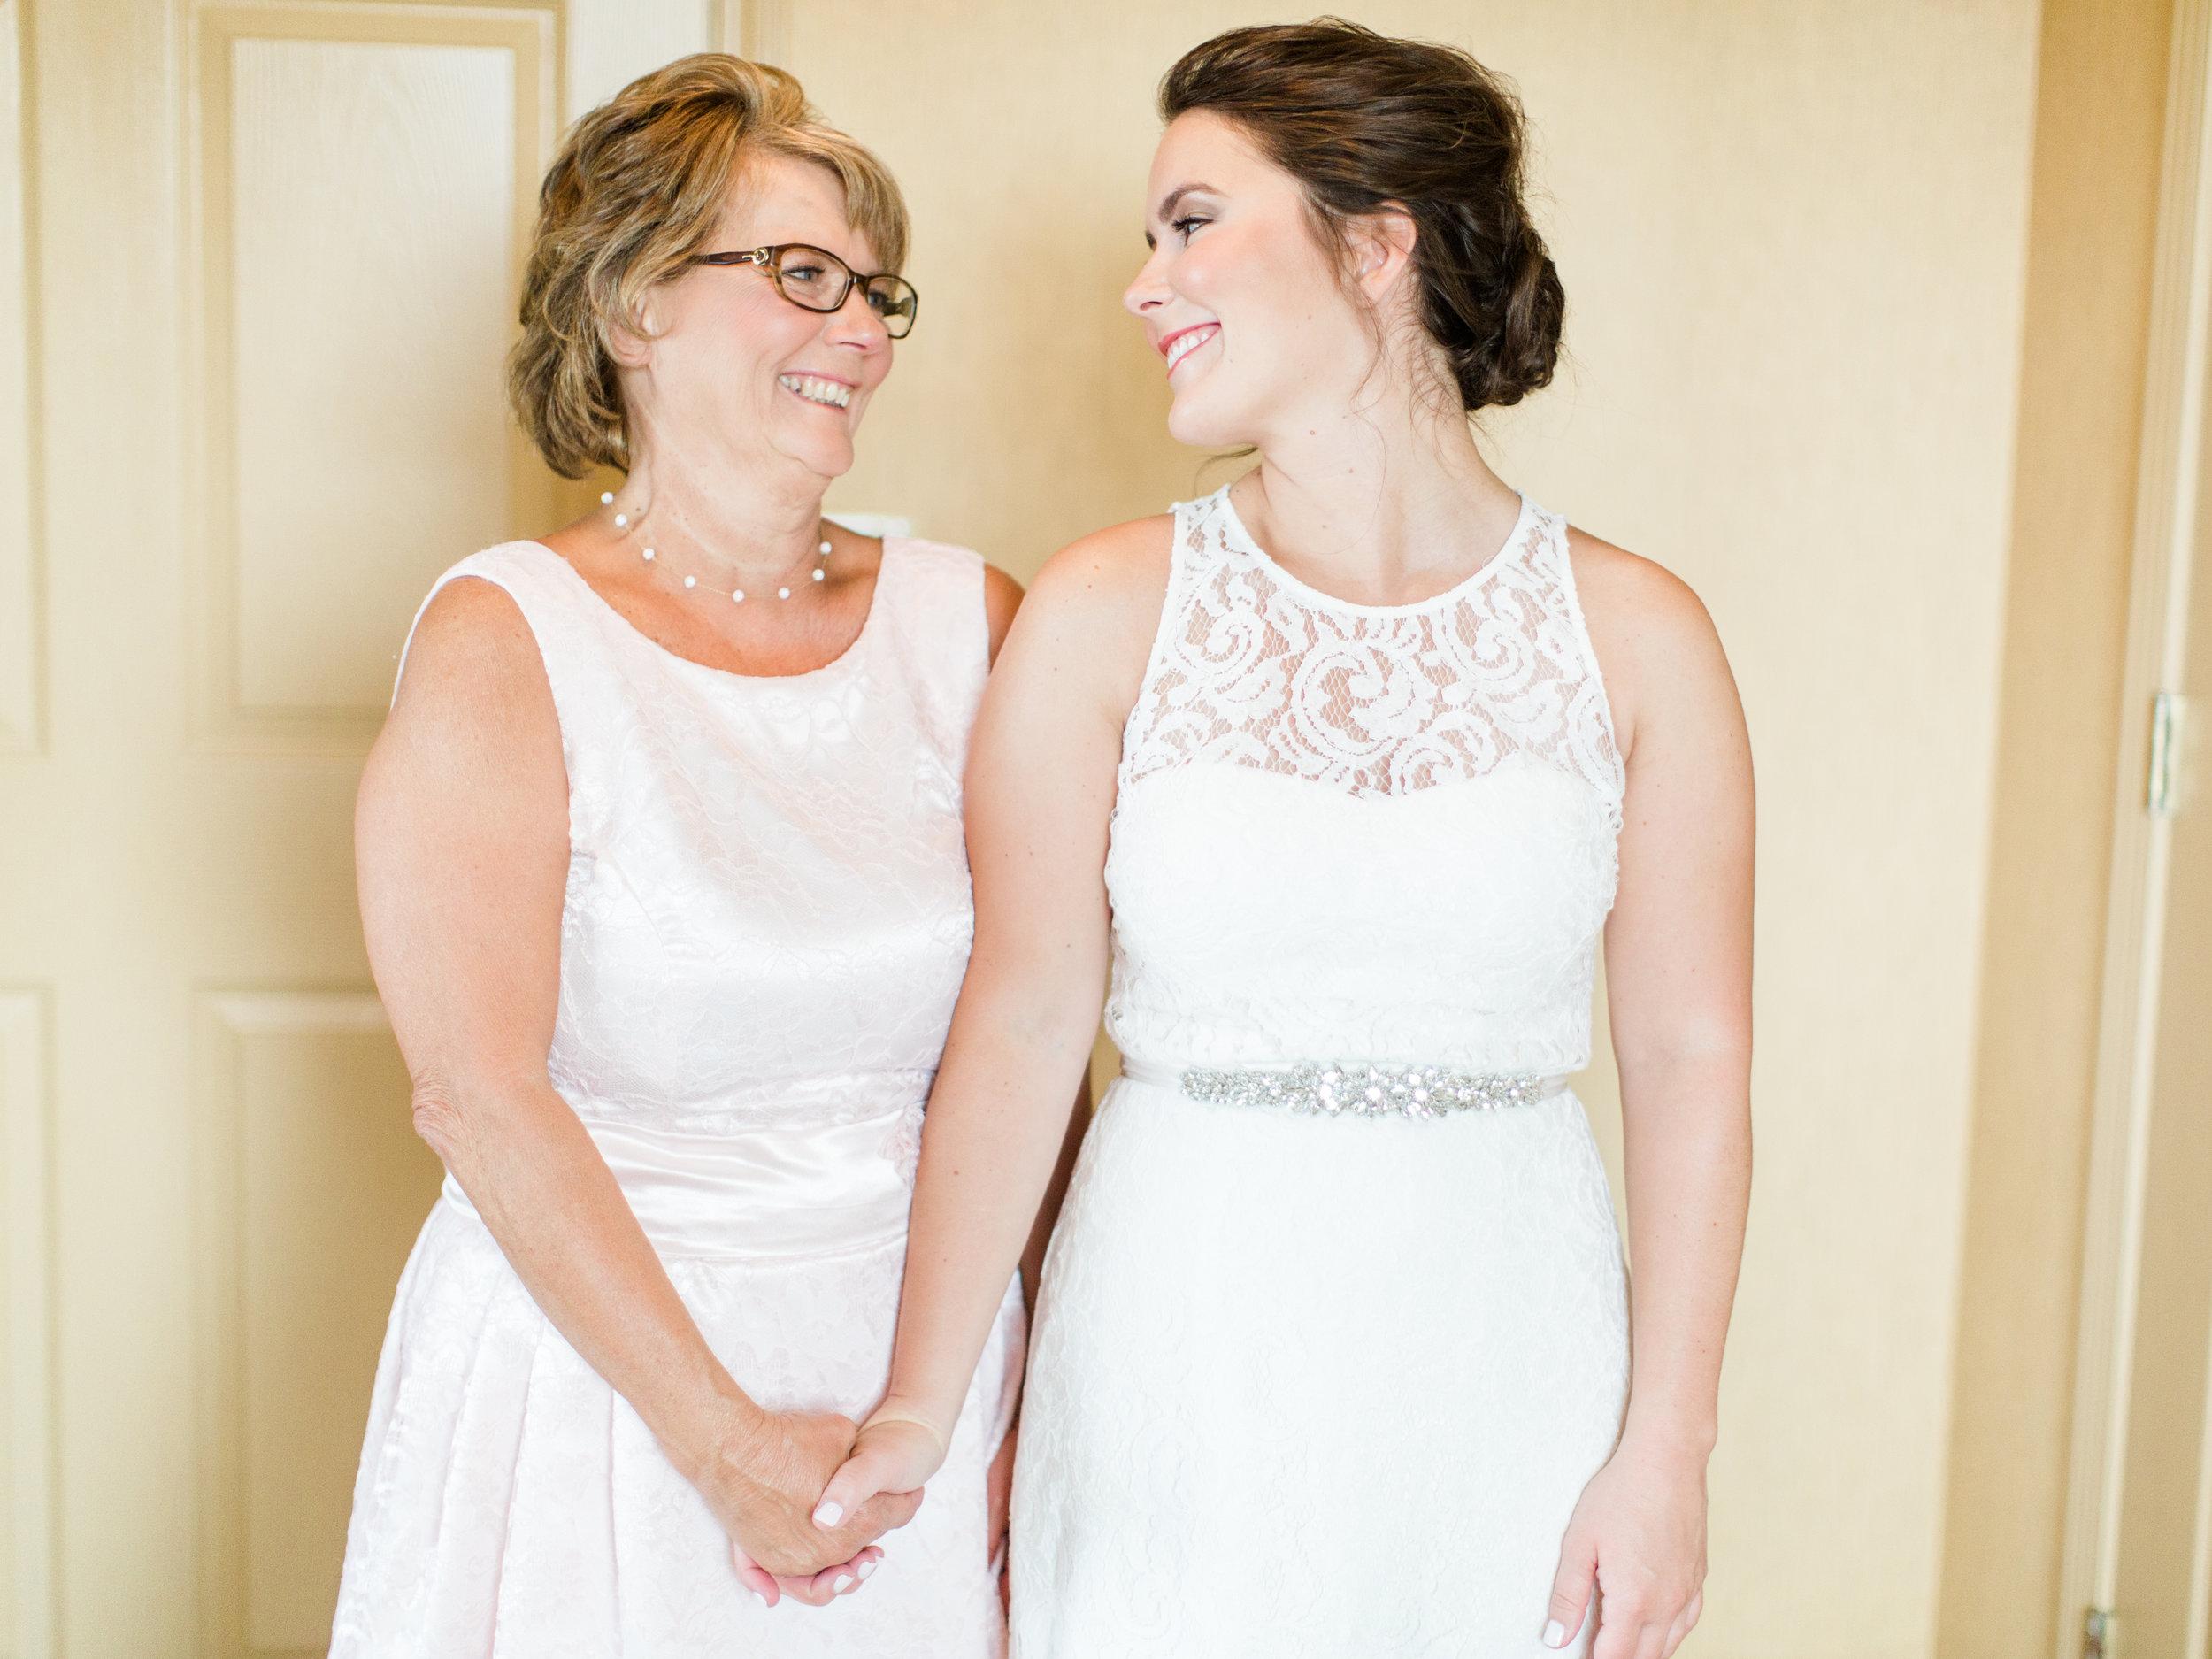 Zoller+Wedding+Getting+Ready-24.jpg